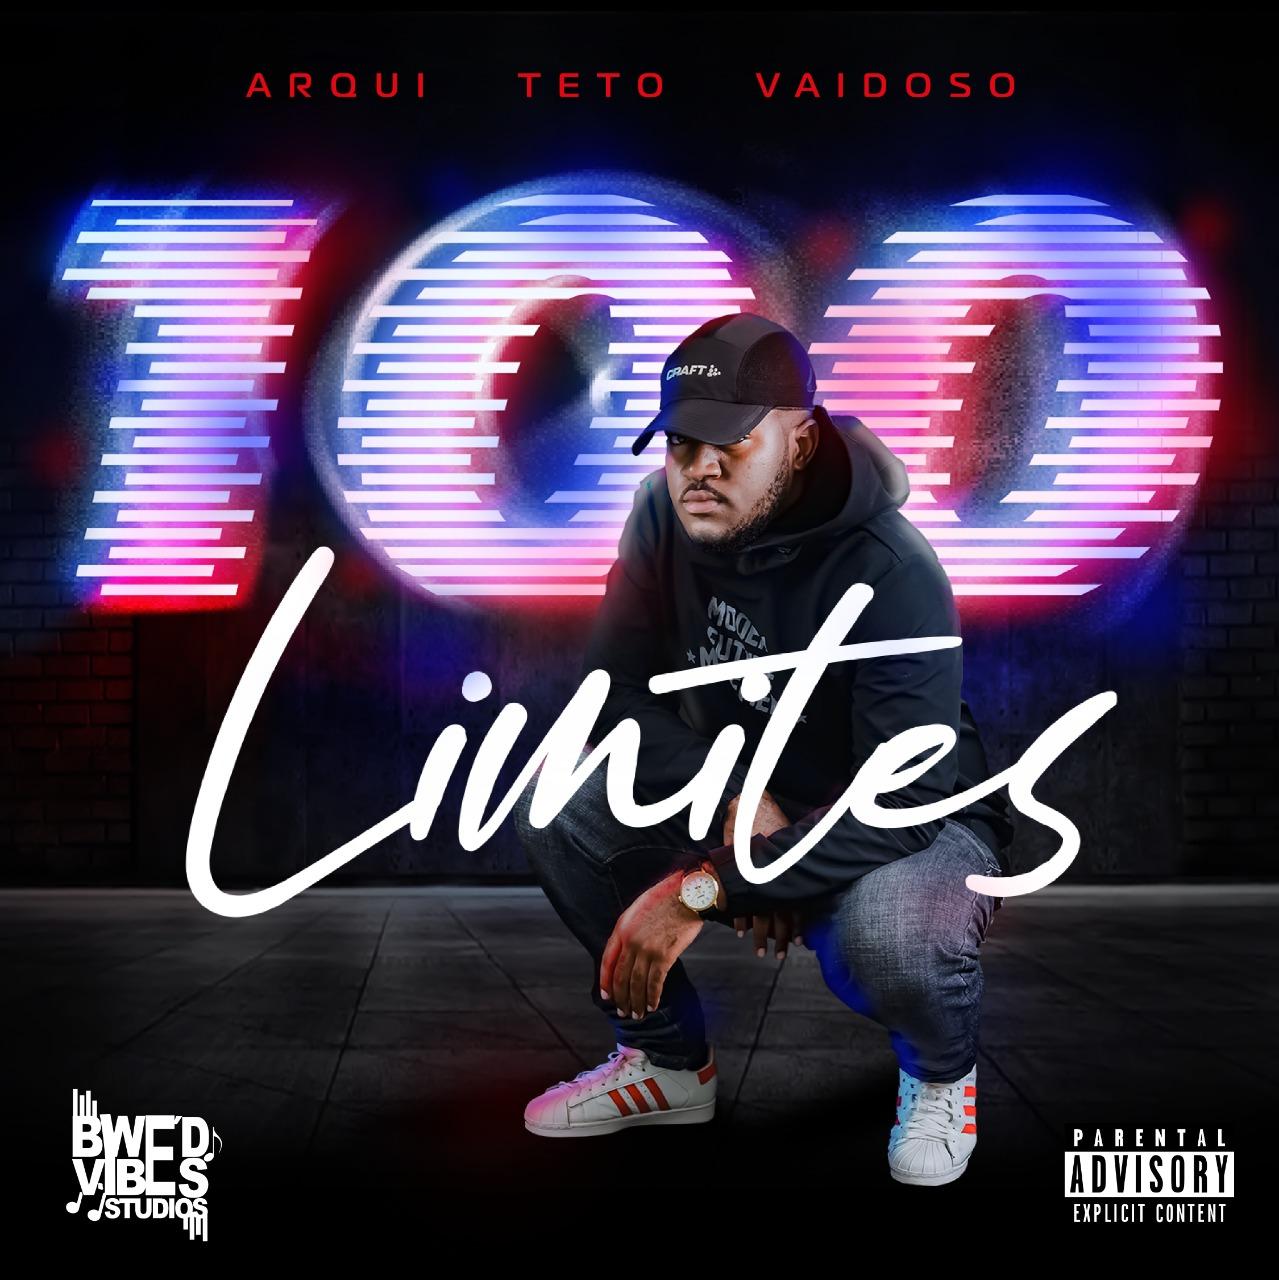 Arqui Teto Vaidoso - 100 Limites (EP)